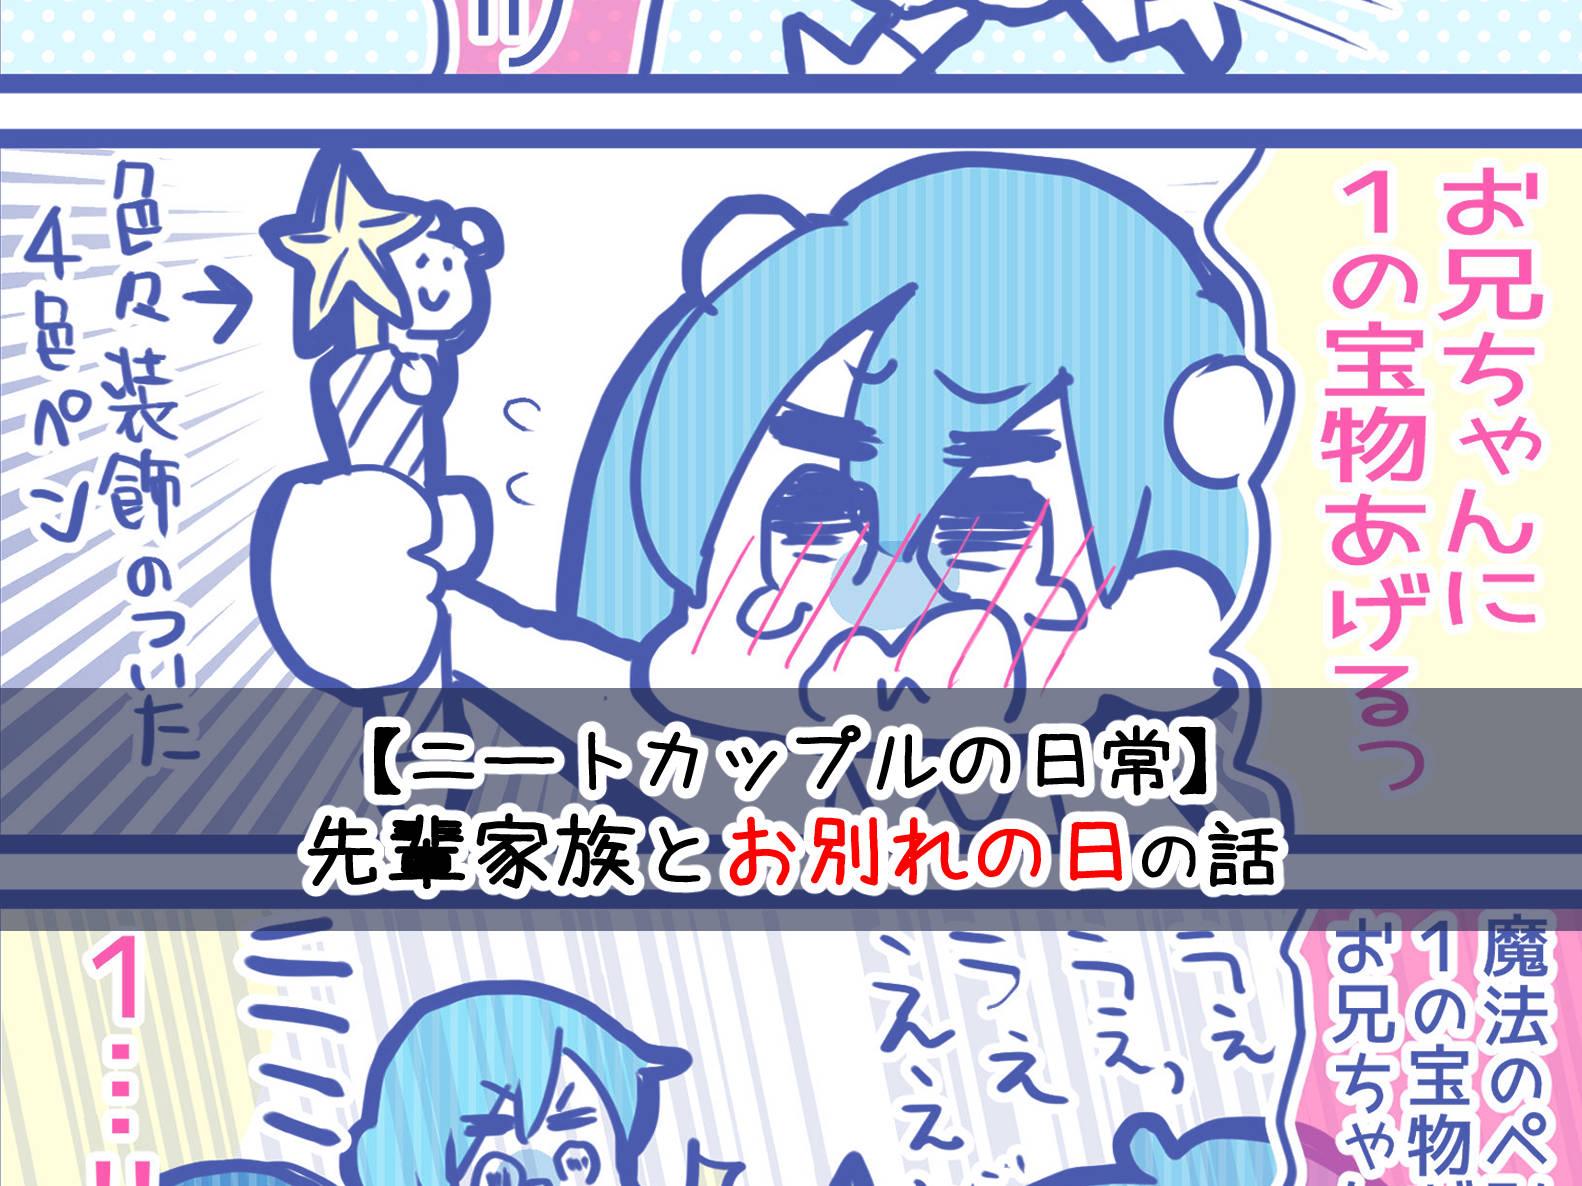 neetsadami.com_12話サムネ